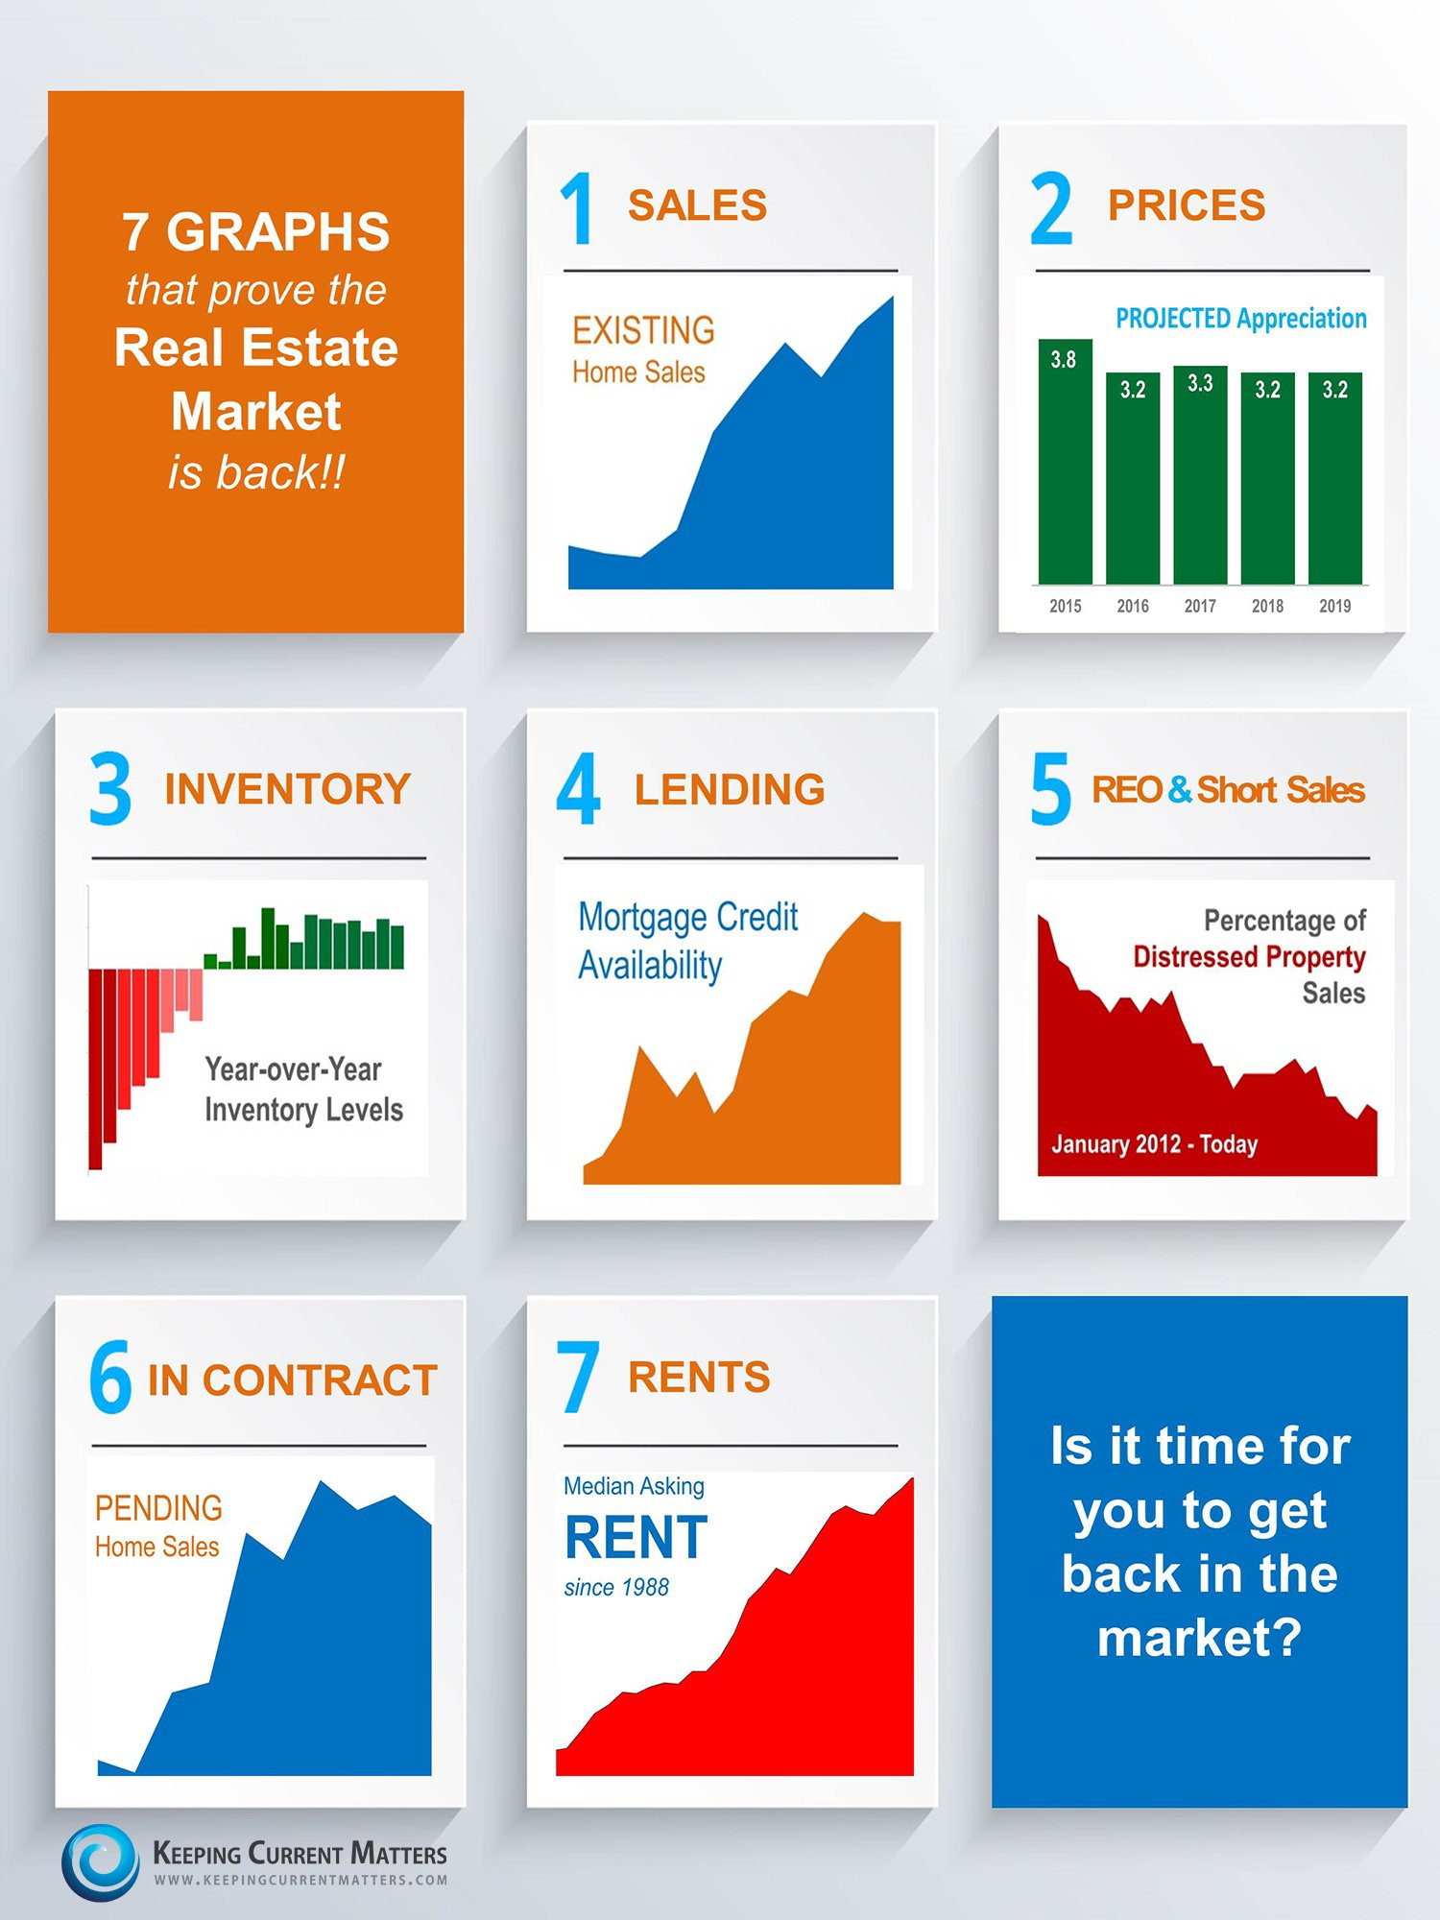 7 graphs that prove